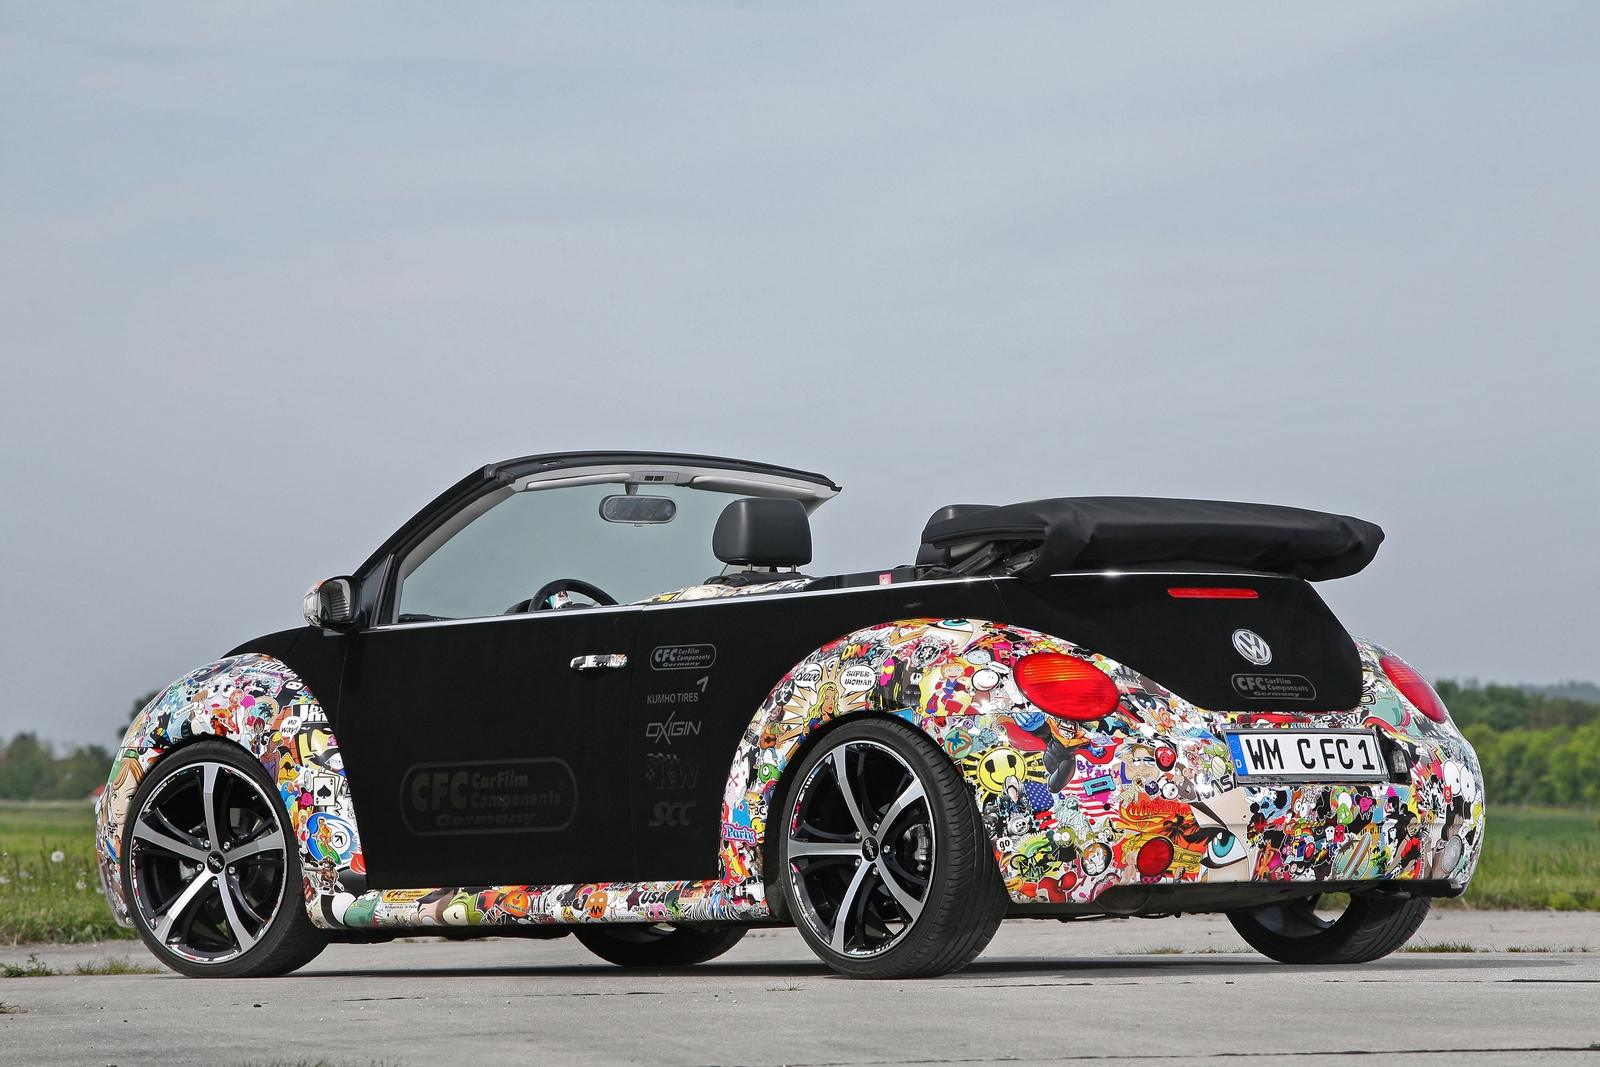 Sticker bomb car design - Cfc Beetle Stickerbomb Side Yep That S Velvet And Rear